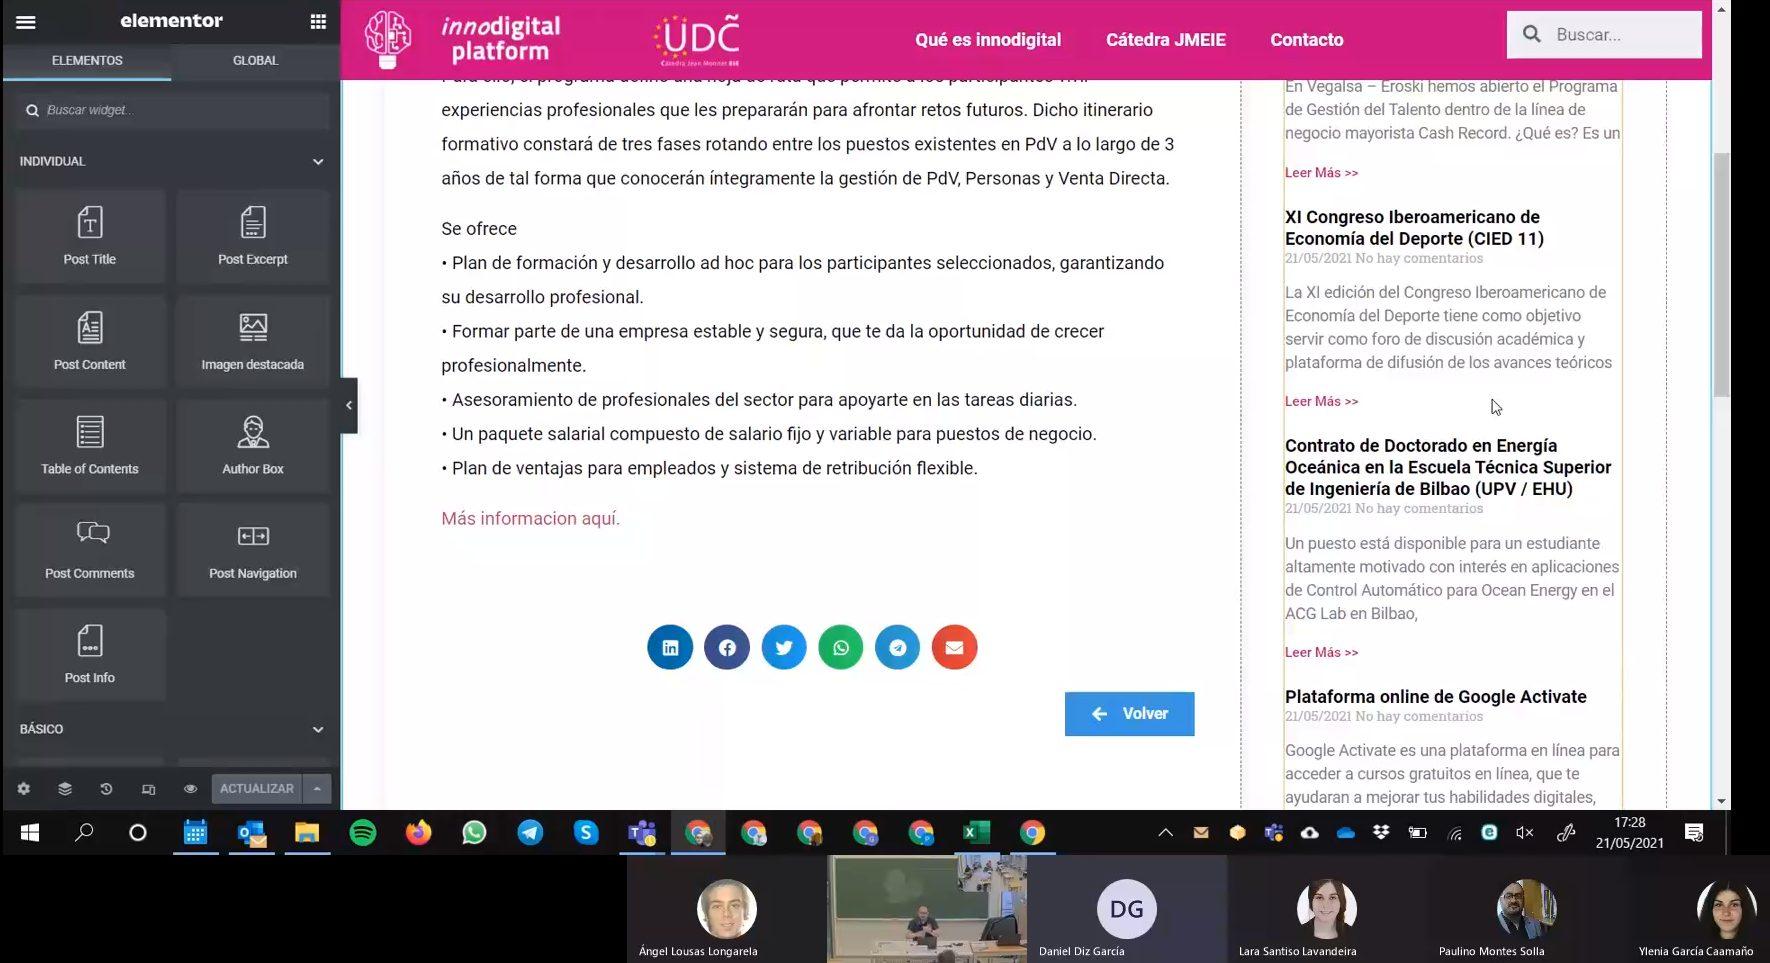 20210521_PaulinoMontes_ConstruccionBlogs